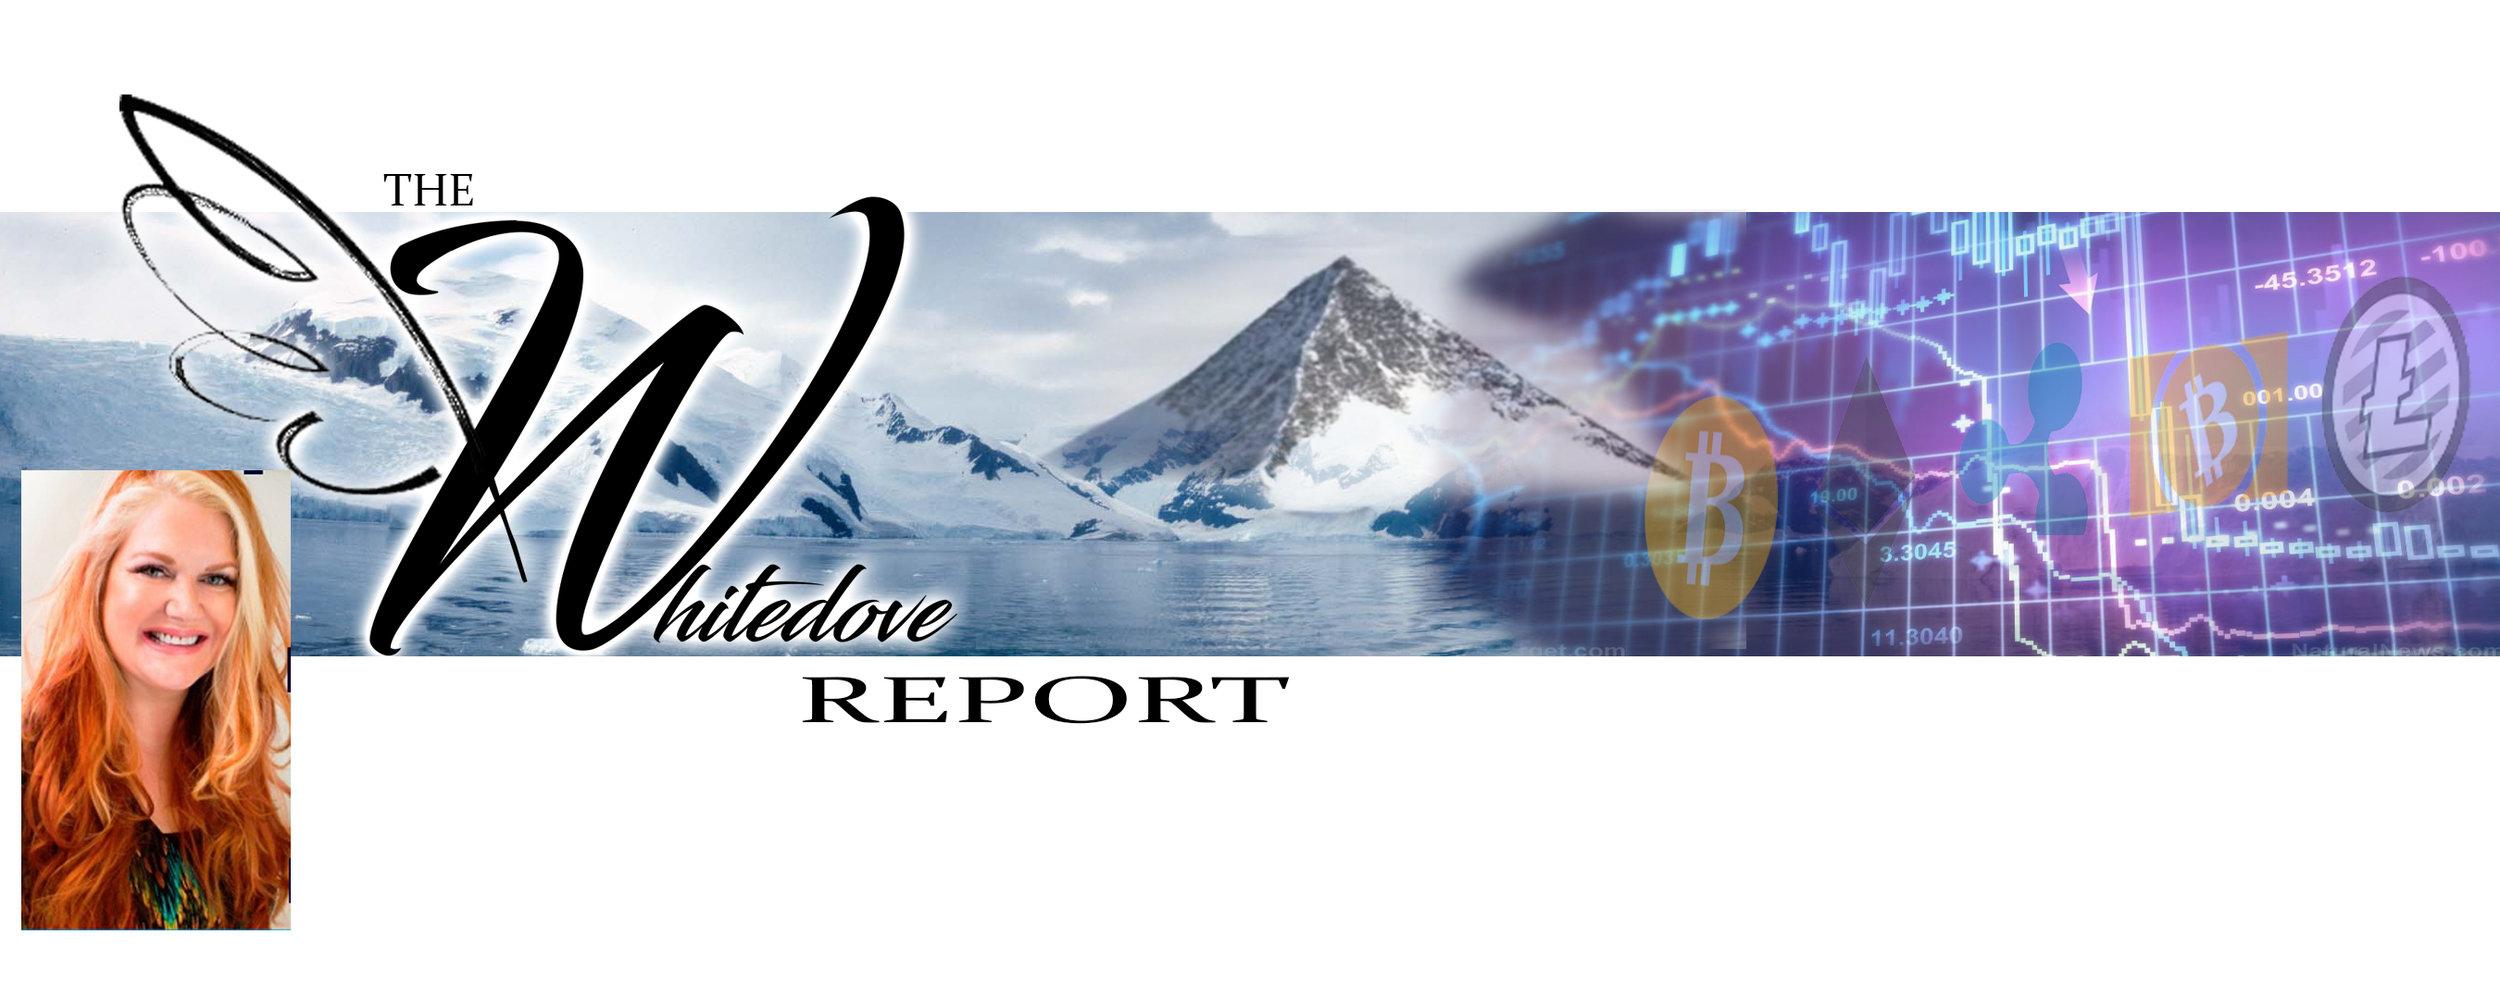 crypto predictions The Whitedove Report Jsnip4